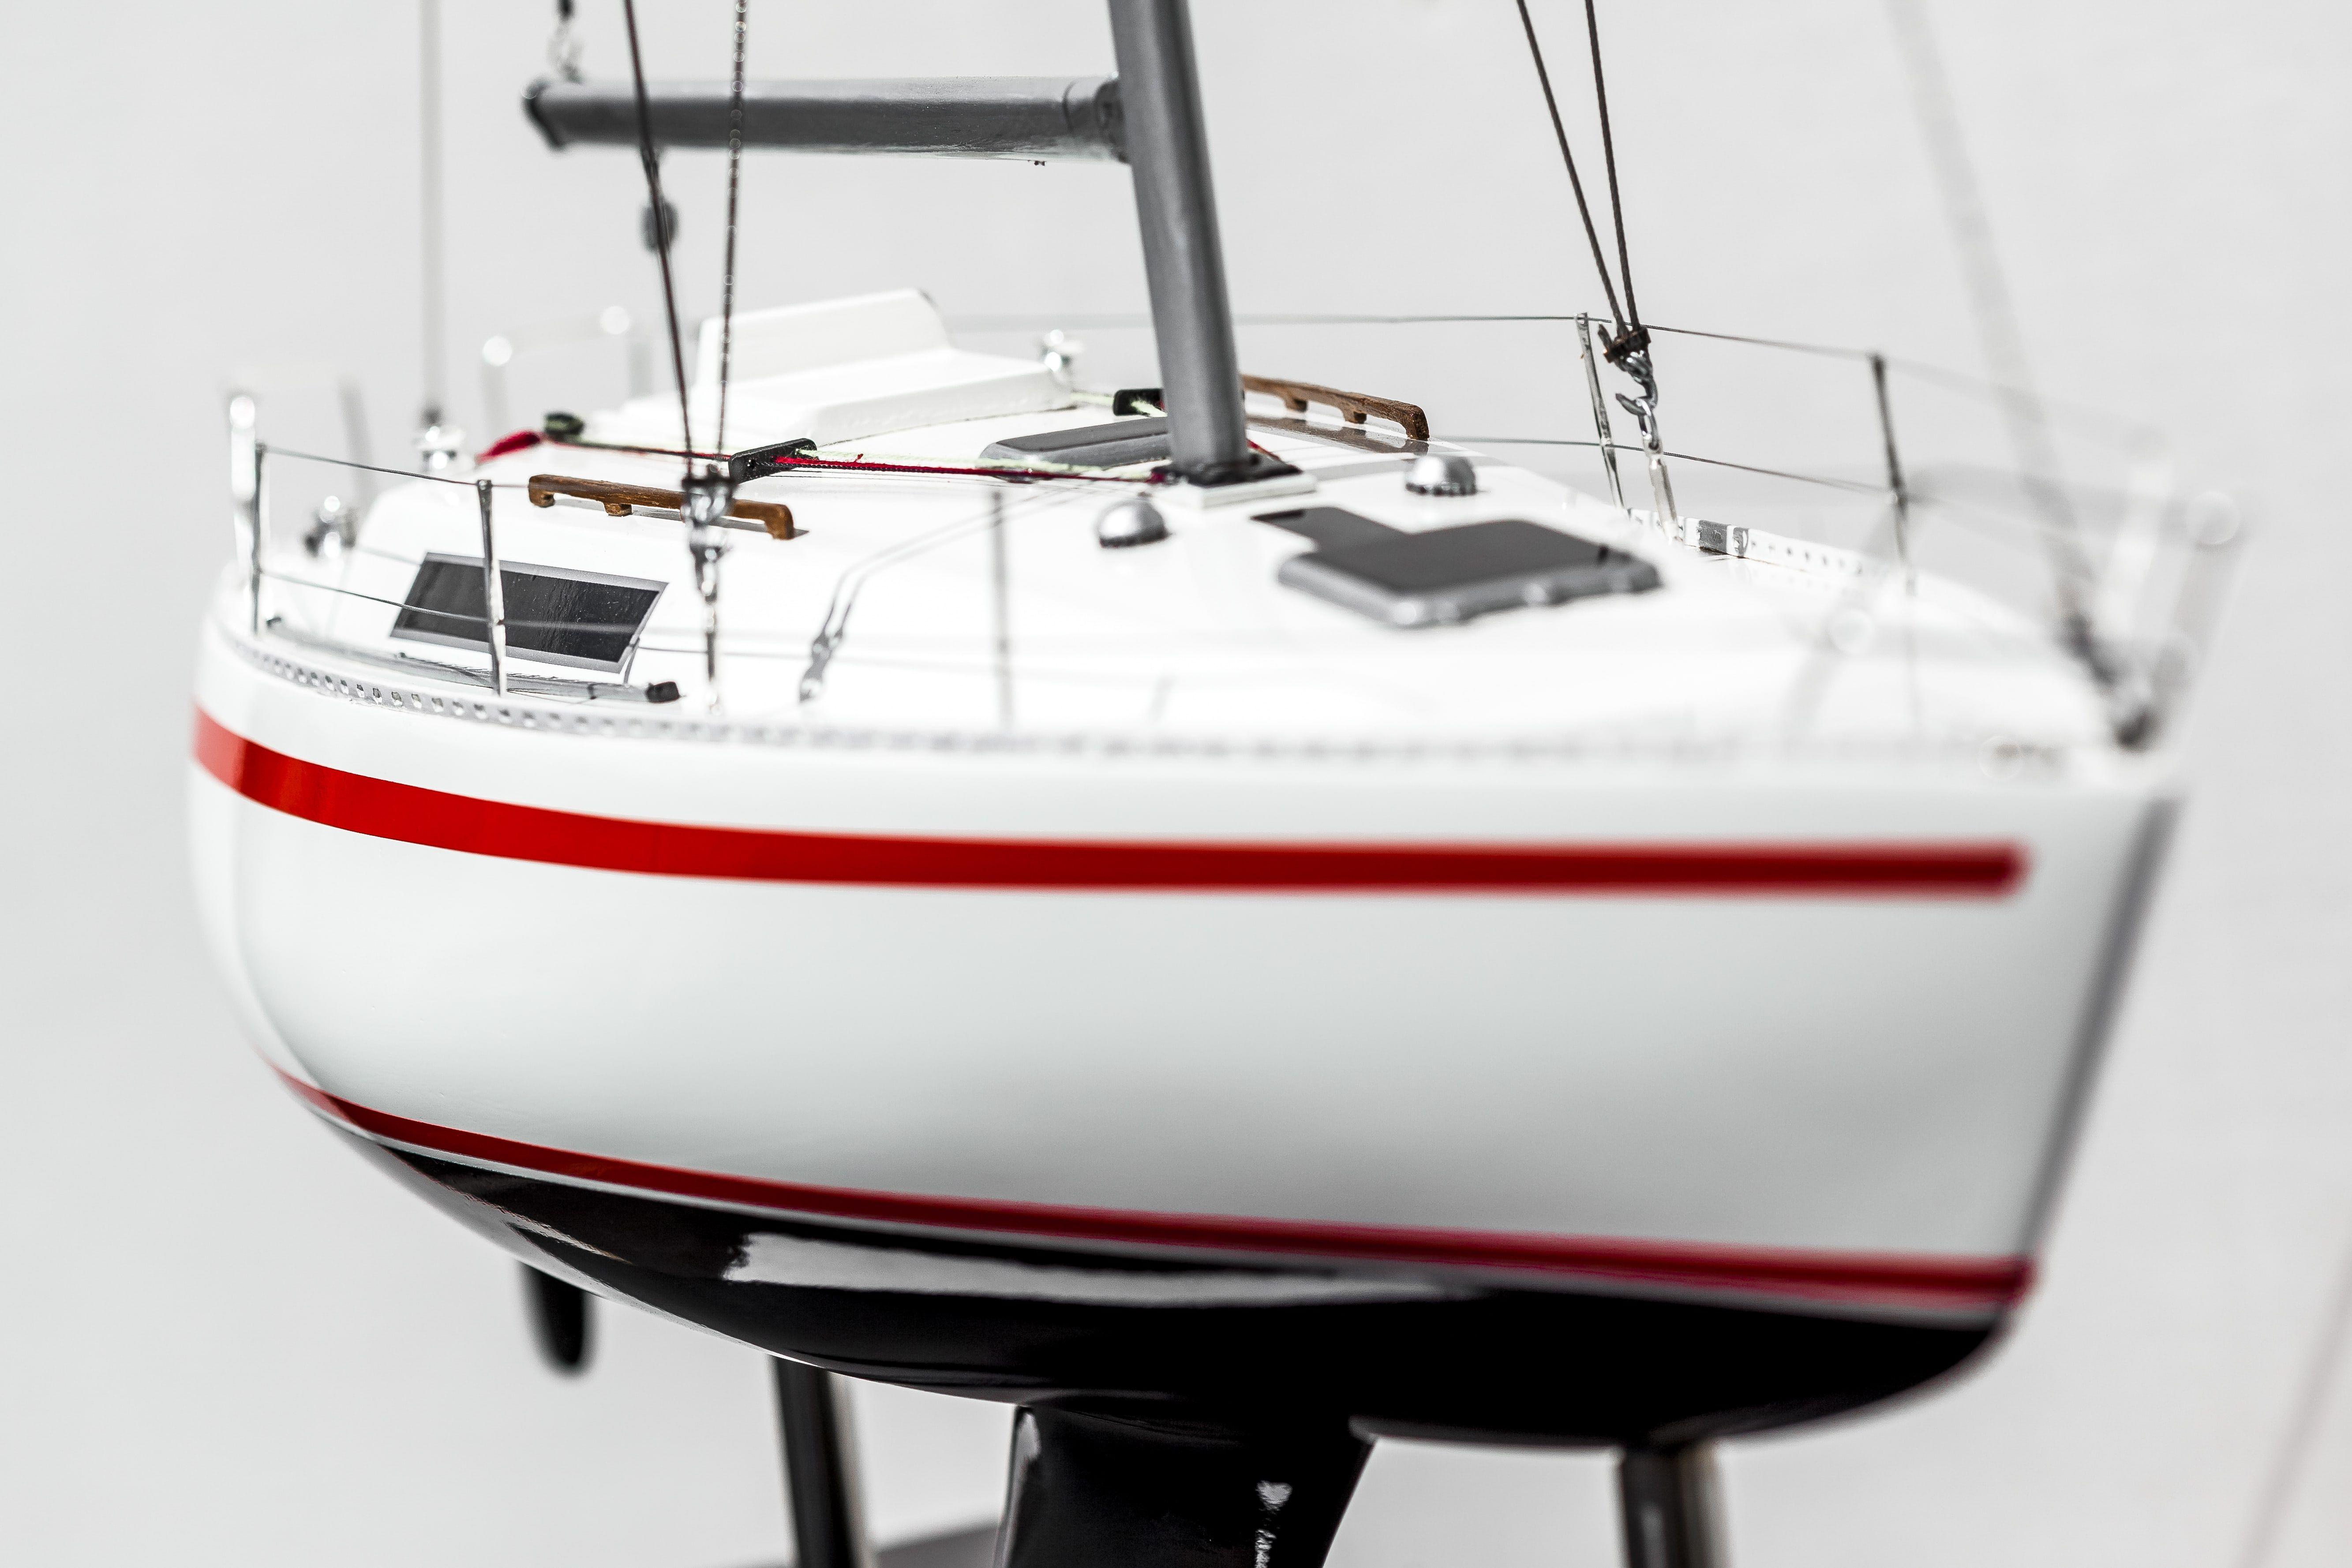 2531-14407-Beneteau-First-30-Model-Yacht-Superior-Range